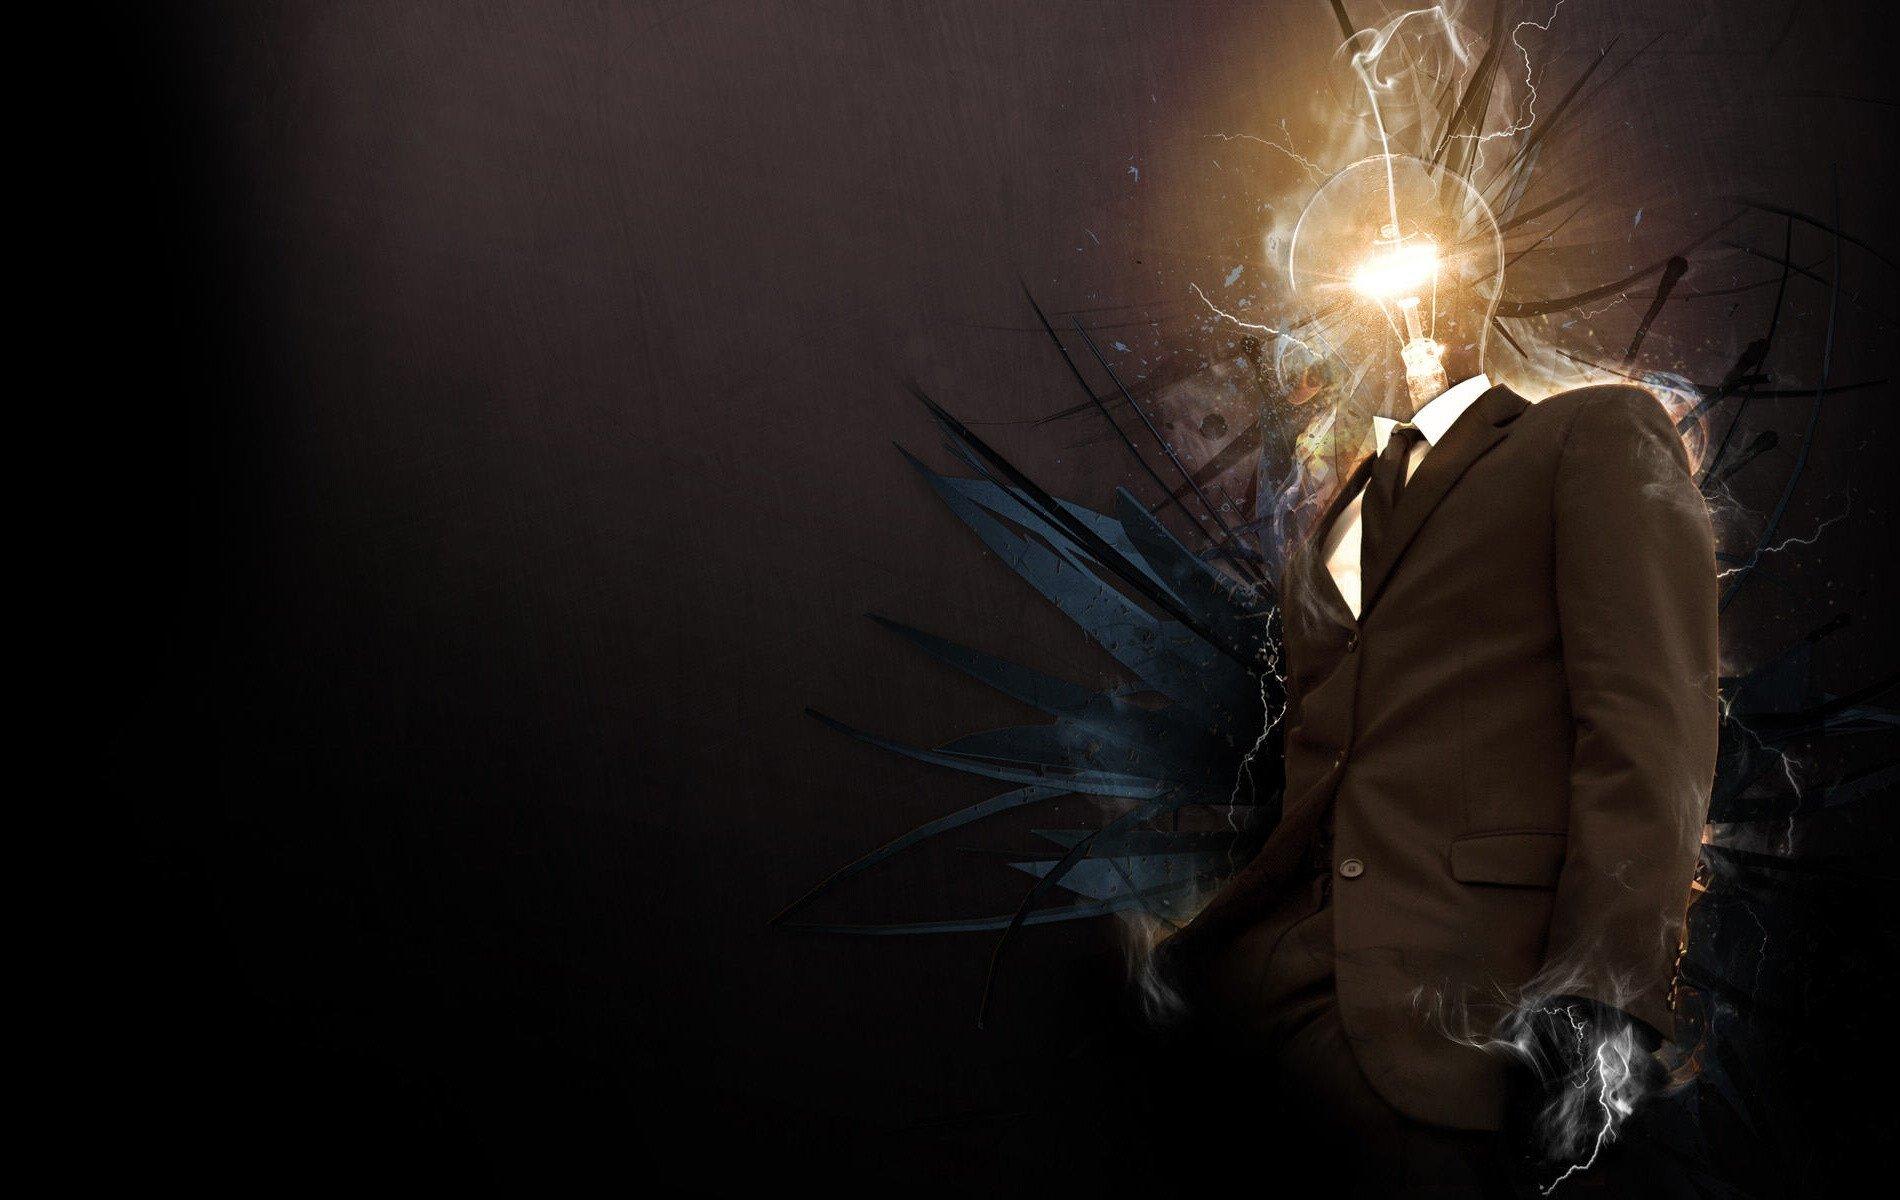 Abstract - Artistic  Man Light Bulb Wallpaper